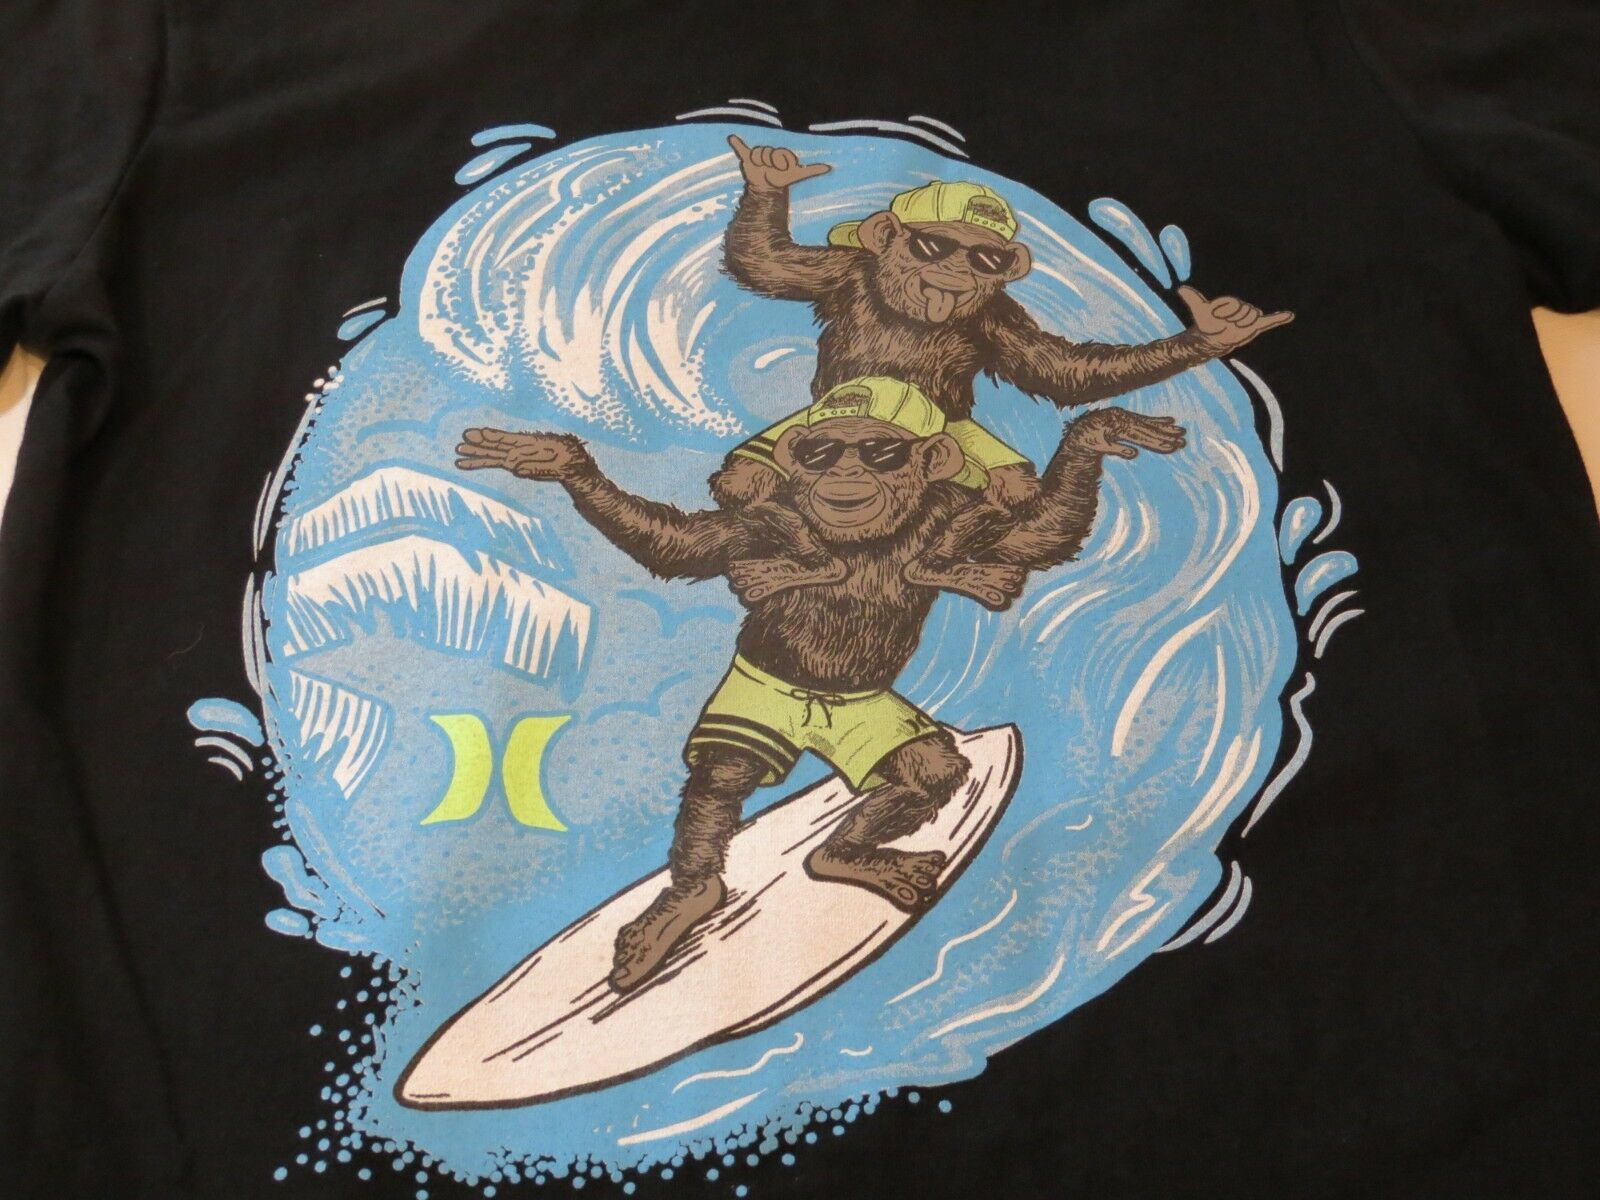 Hurley Boys youth short sleeve t shirt XL 13-15 Years 983007-023 Black Monkeys